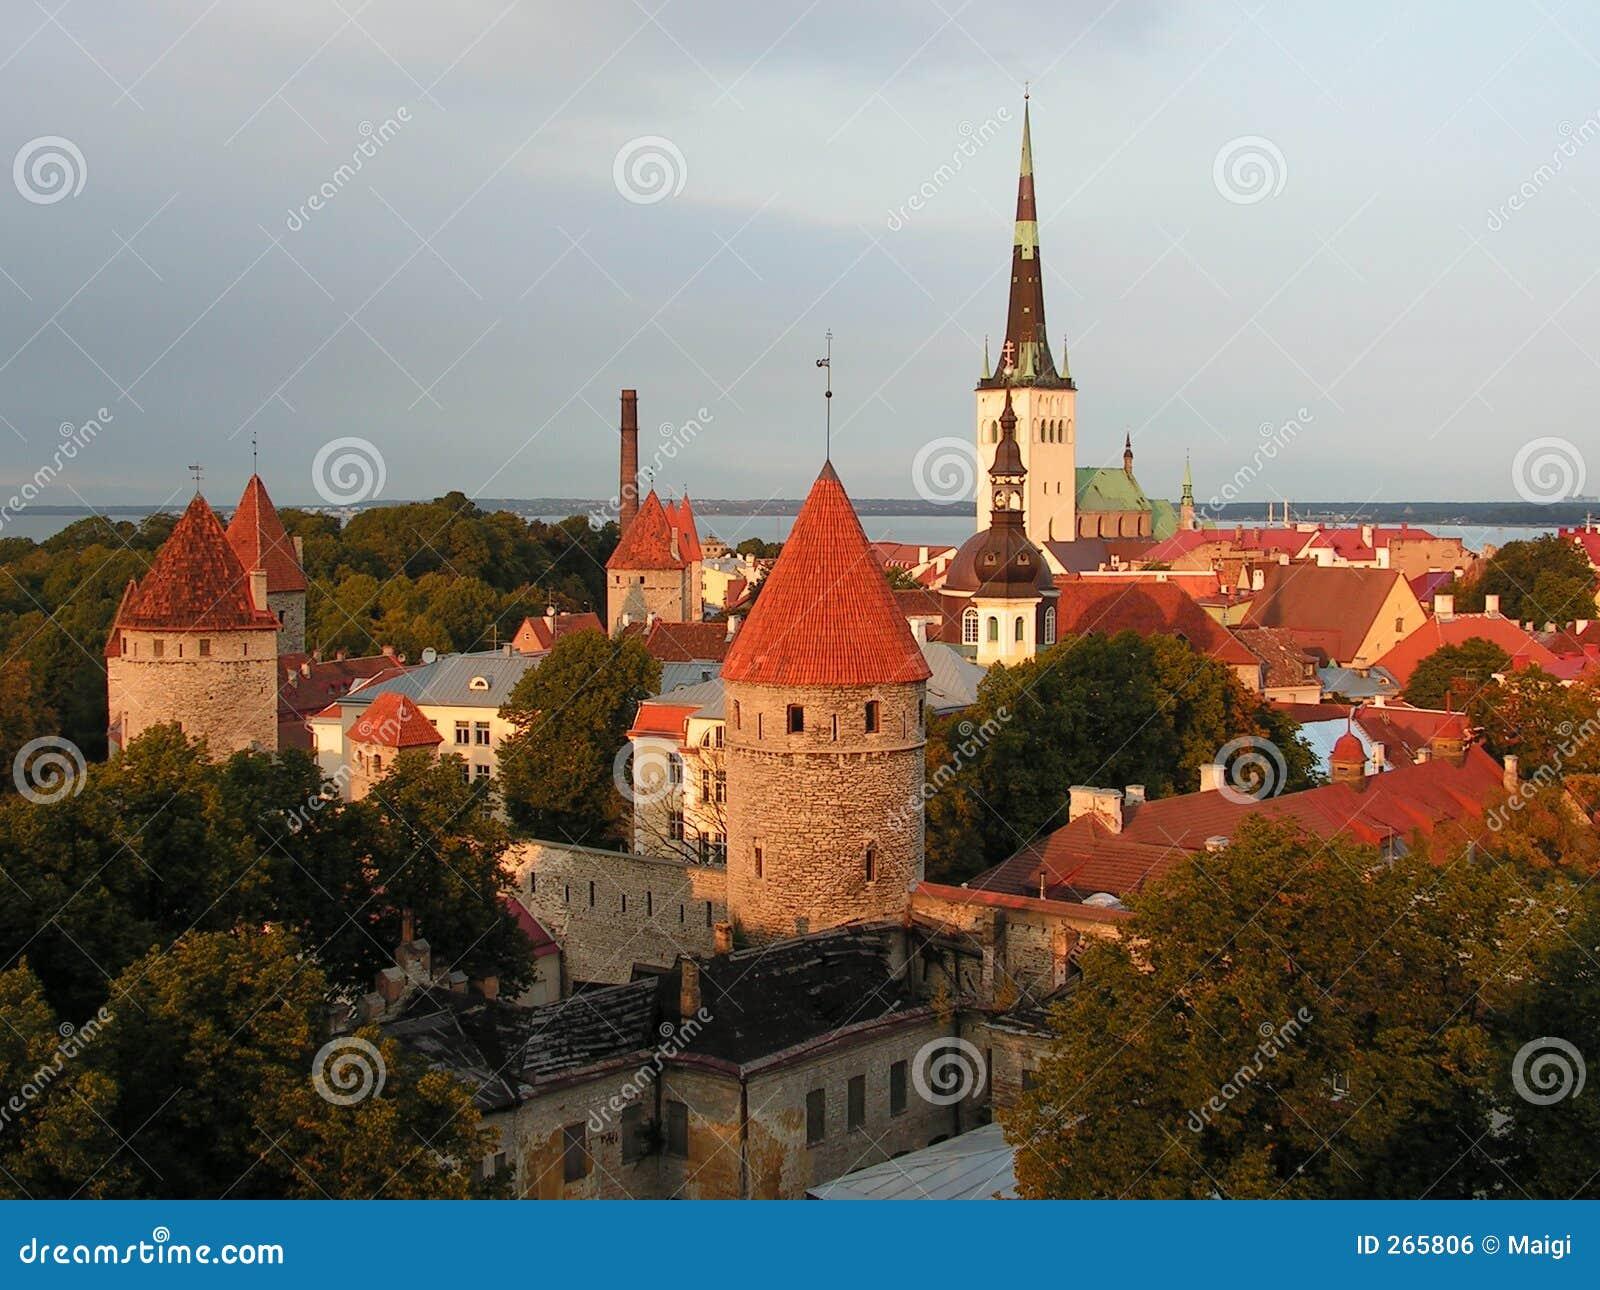 old town of tallinn estonia stock photo image of. Black Bedroom Furniture Sets. Home Design Ideas